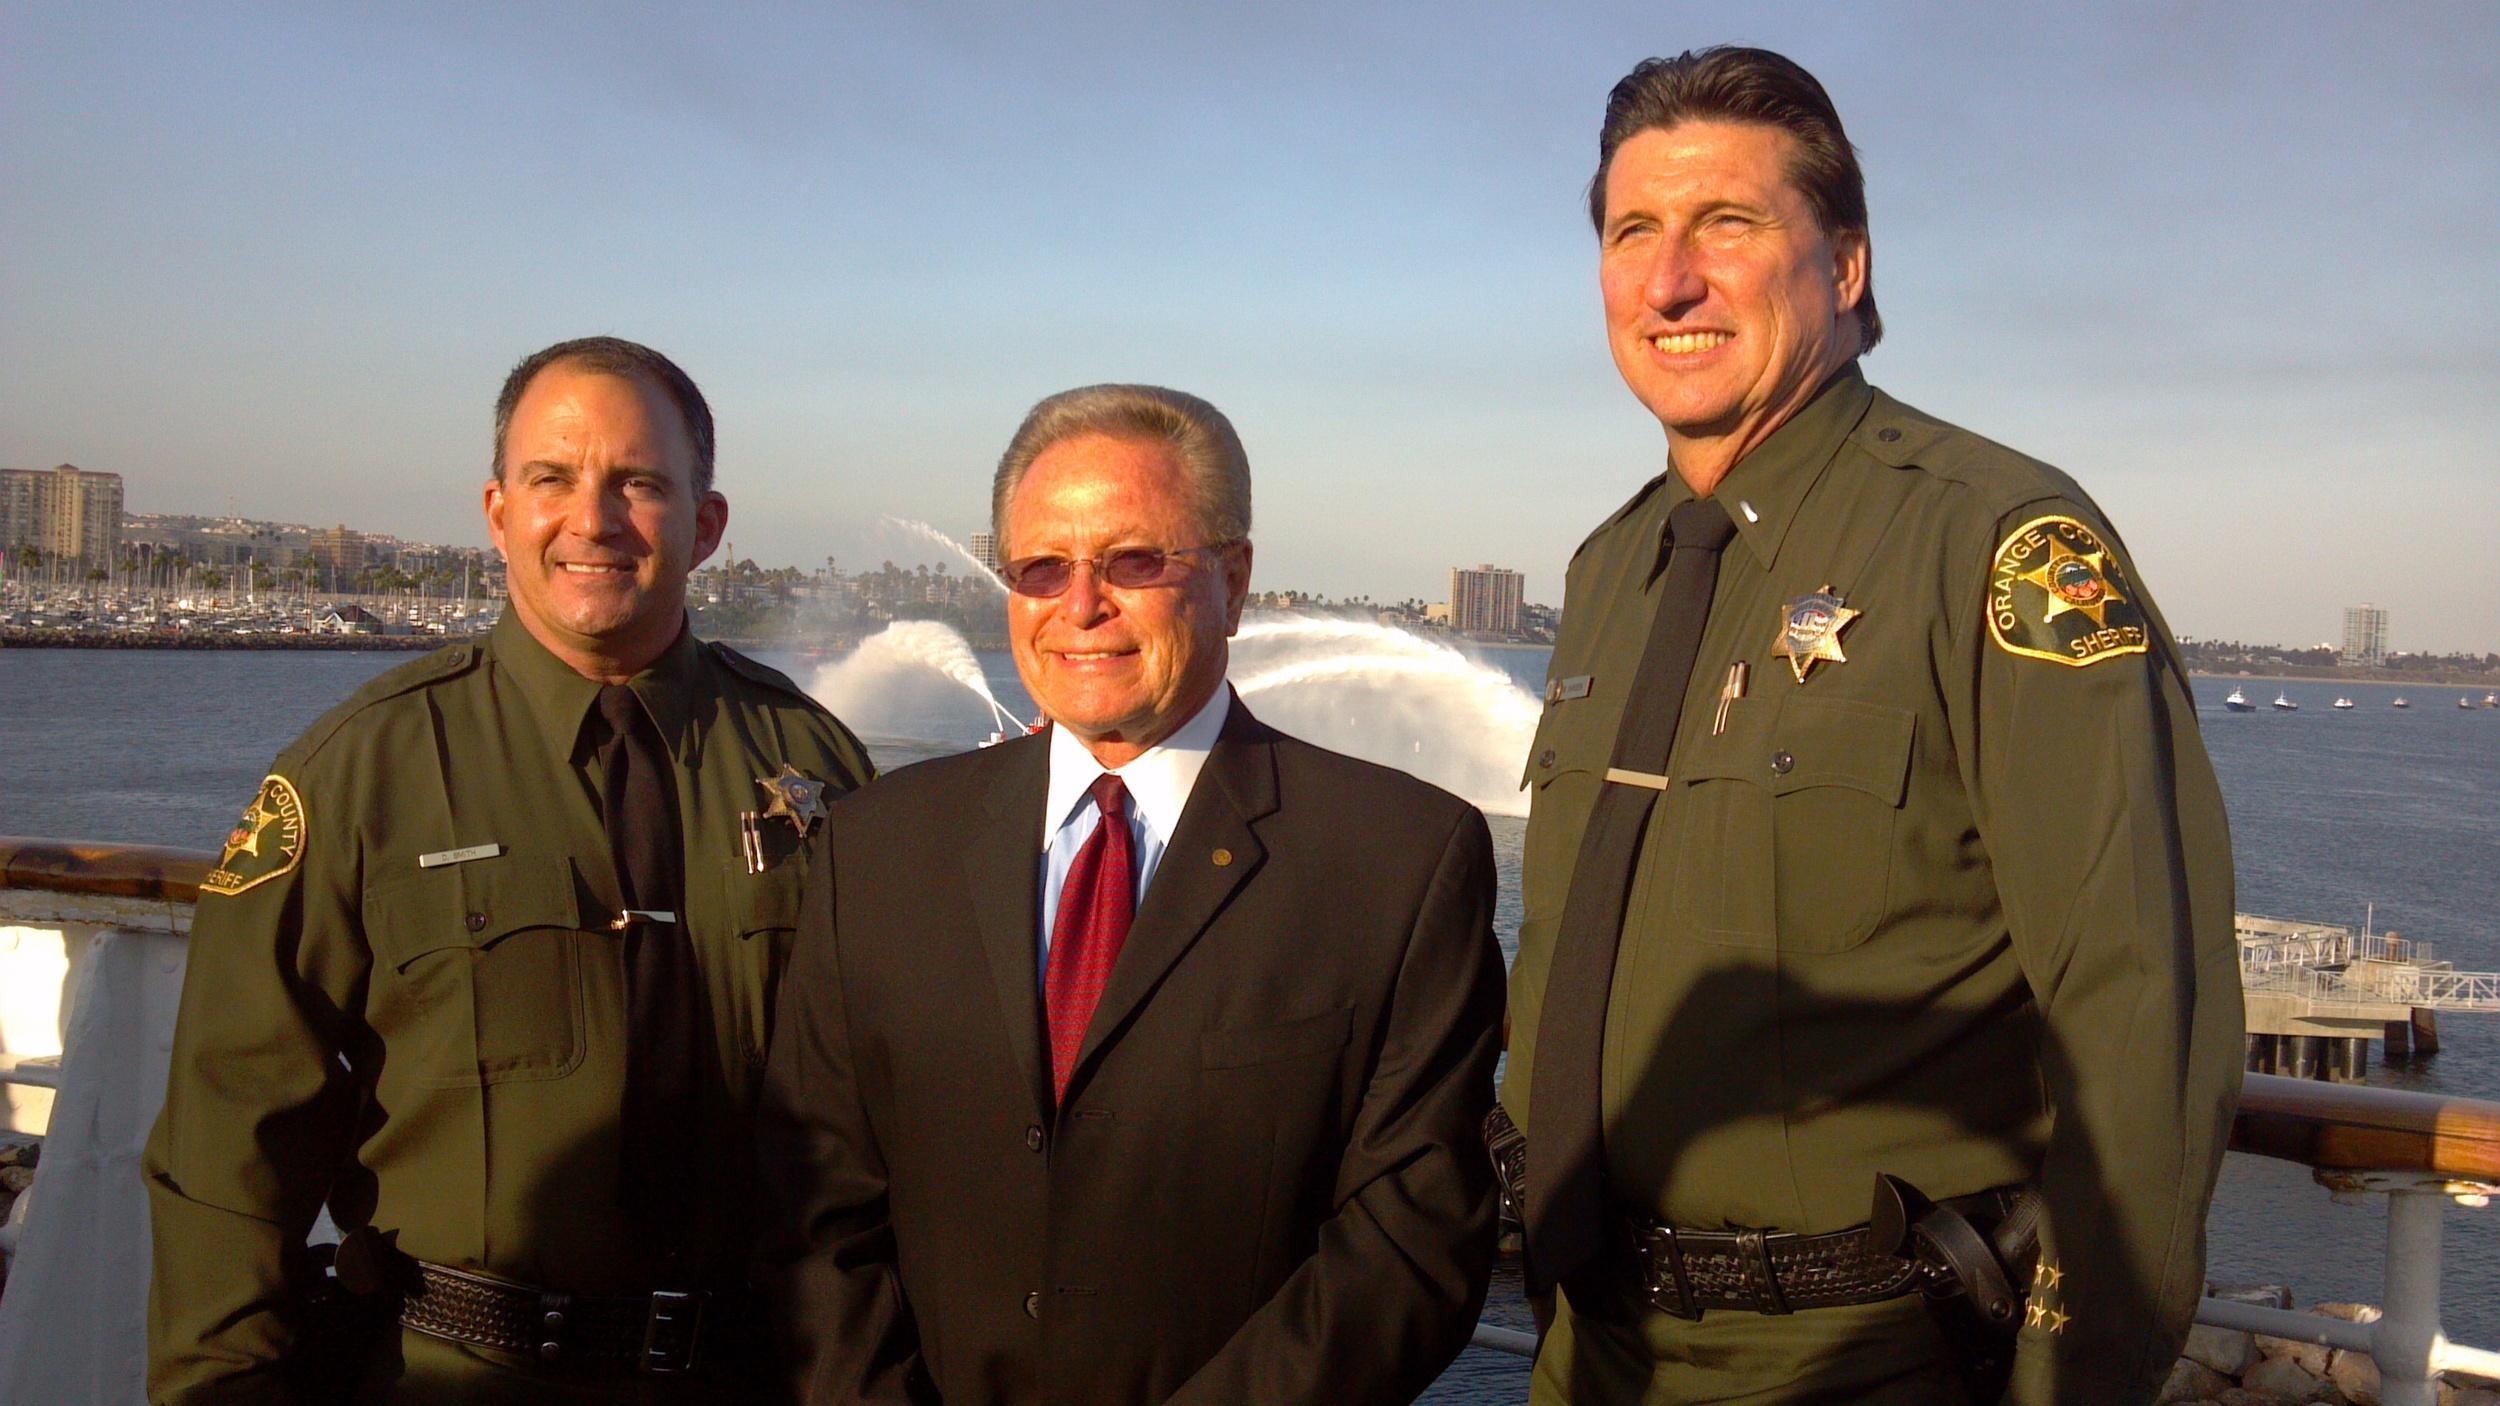 Sheriff's Deputies with Guy Fox